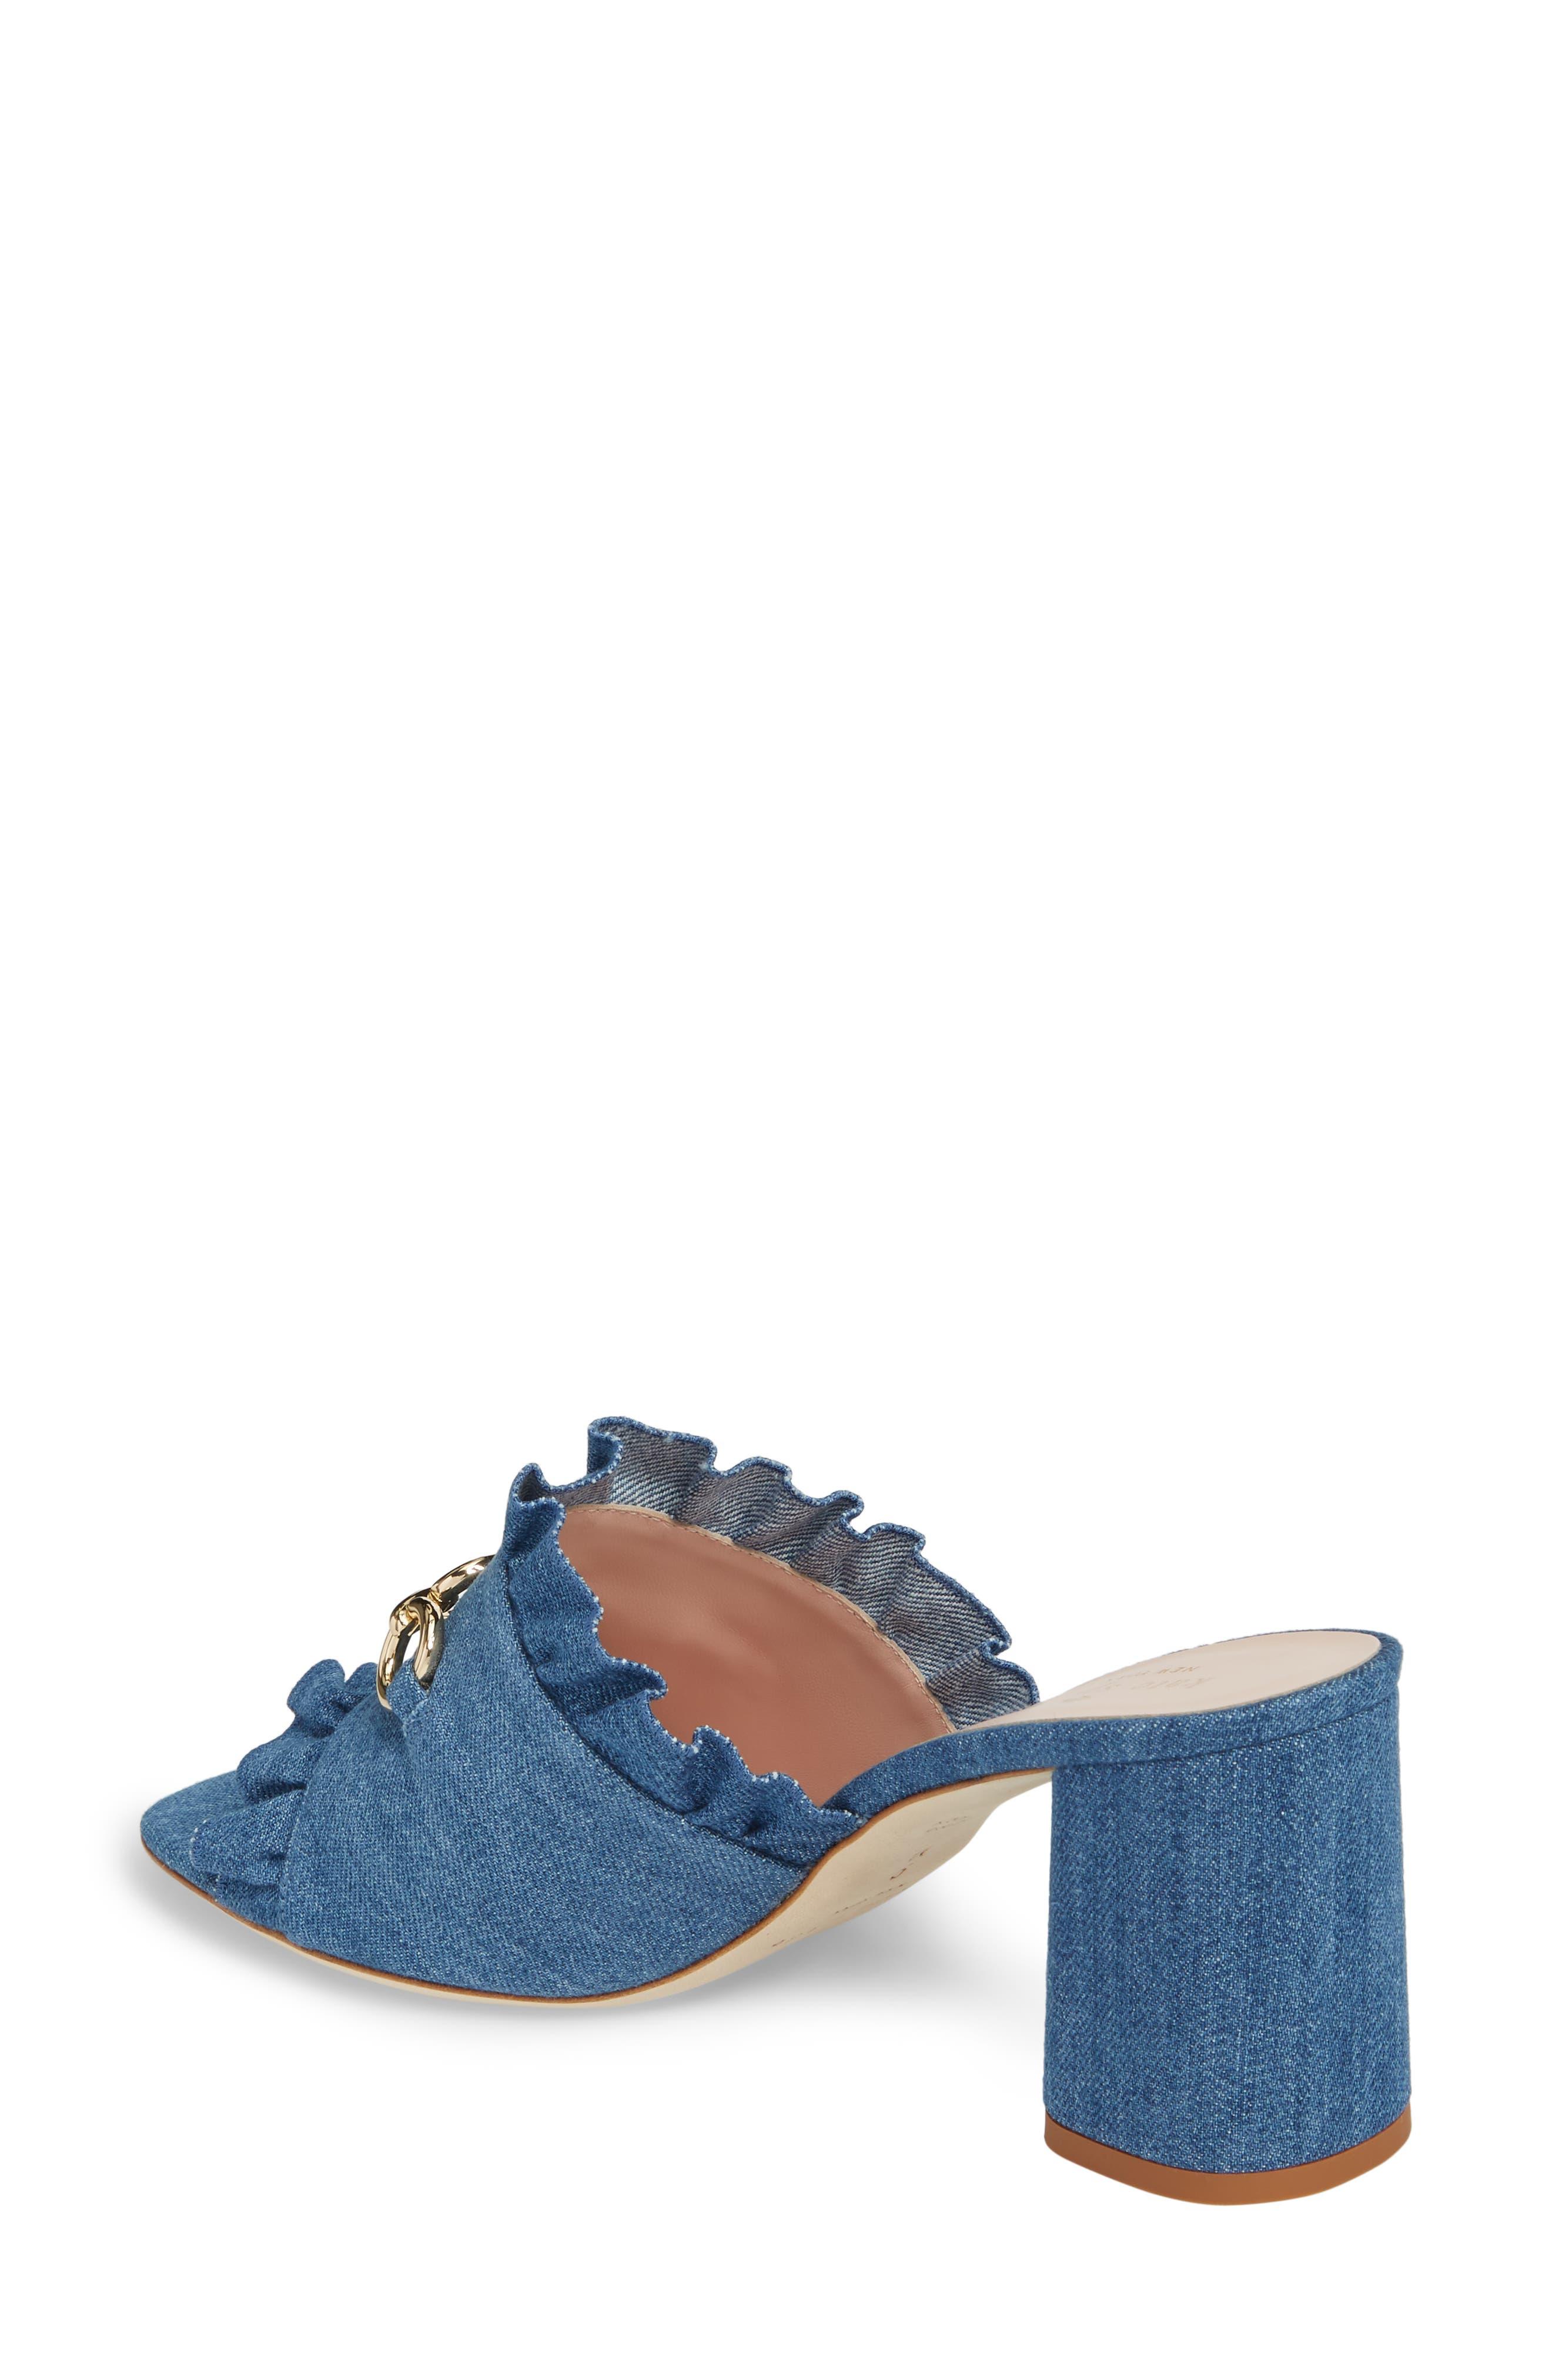 Alternate Image 2  - kate spade new york demmi sandal (Women)